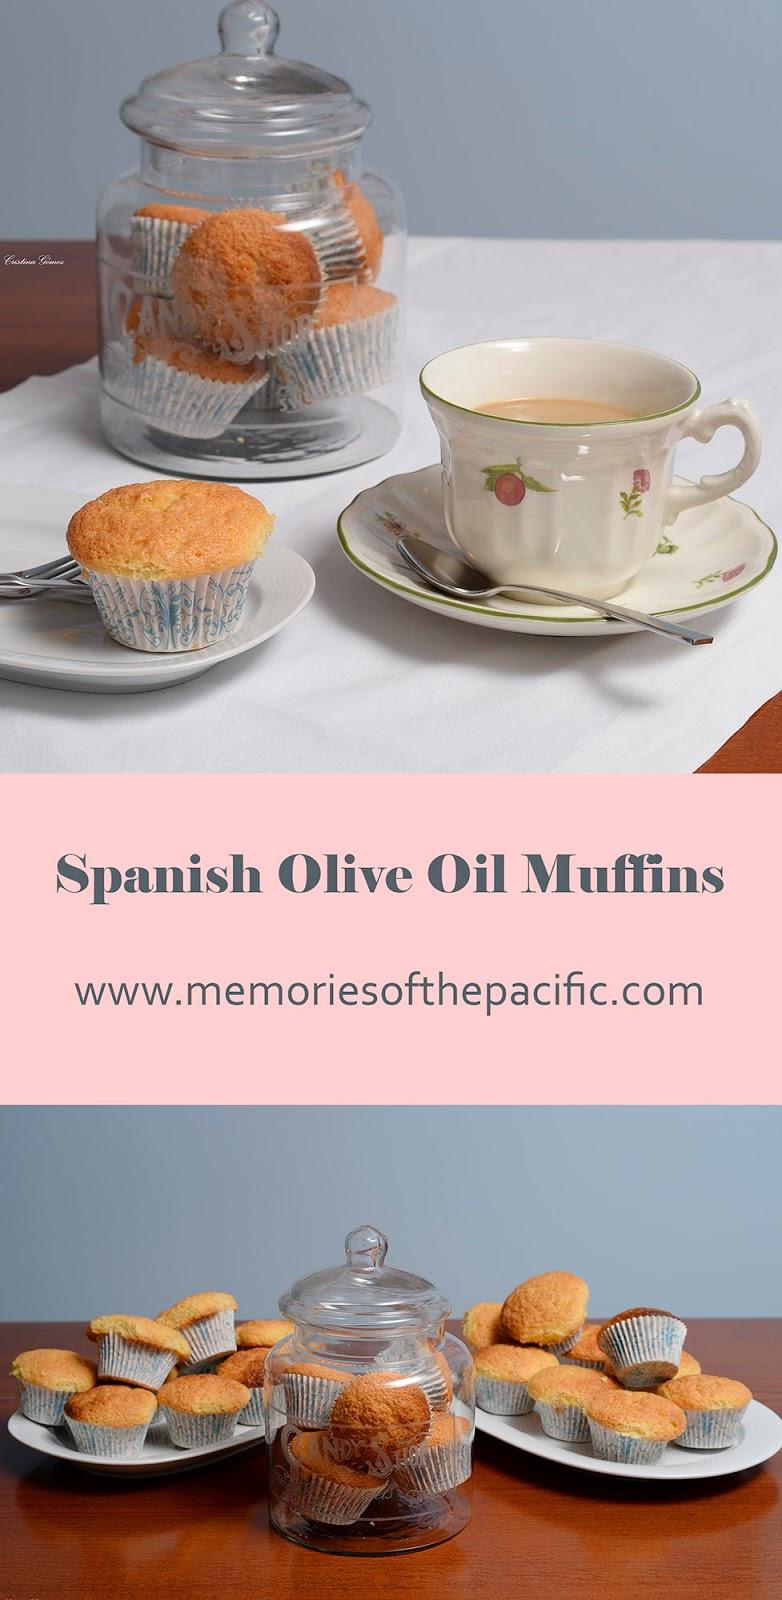 homemade muffins olive oil spanish magdalena casera